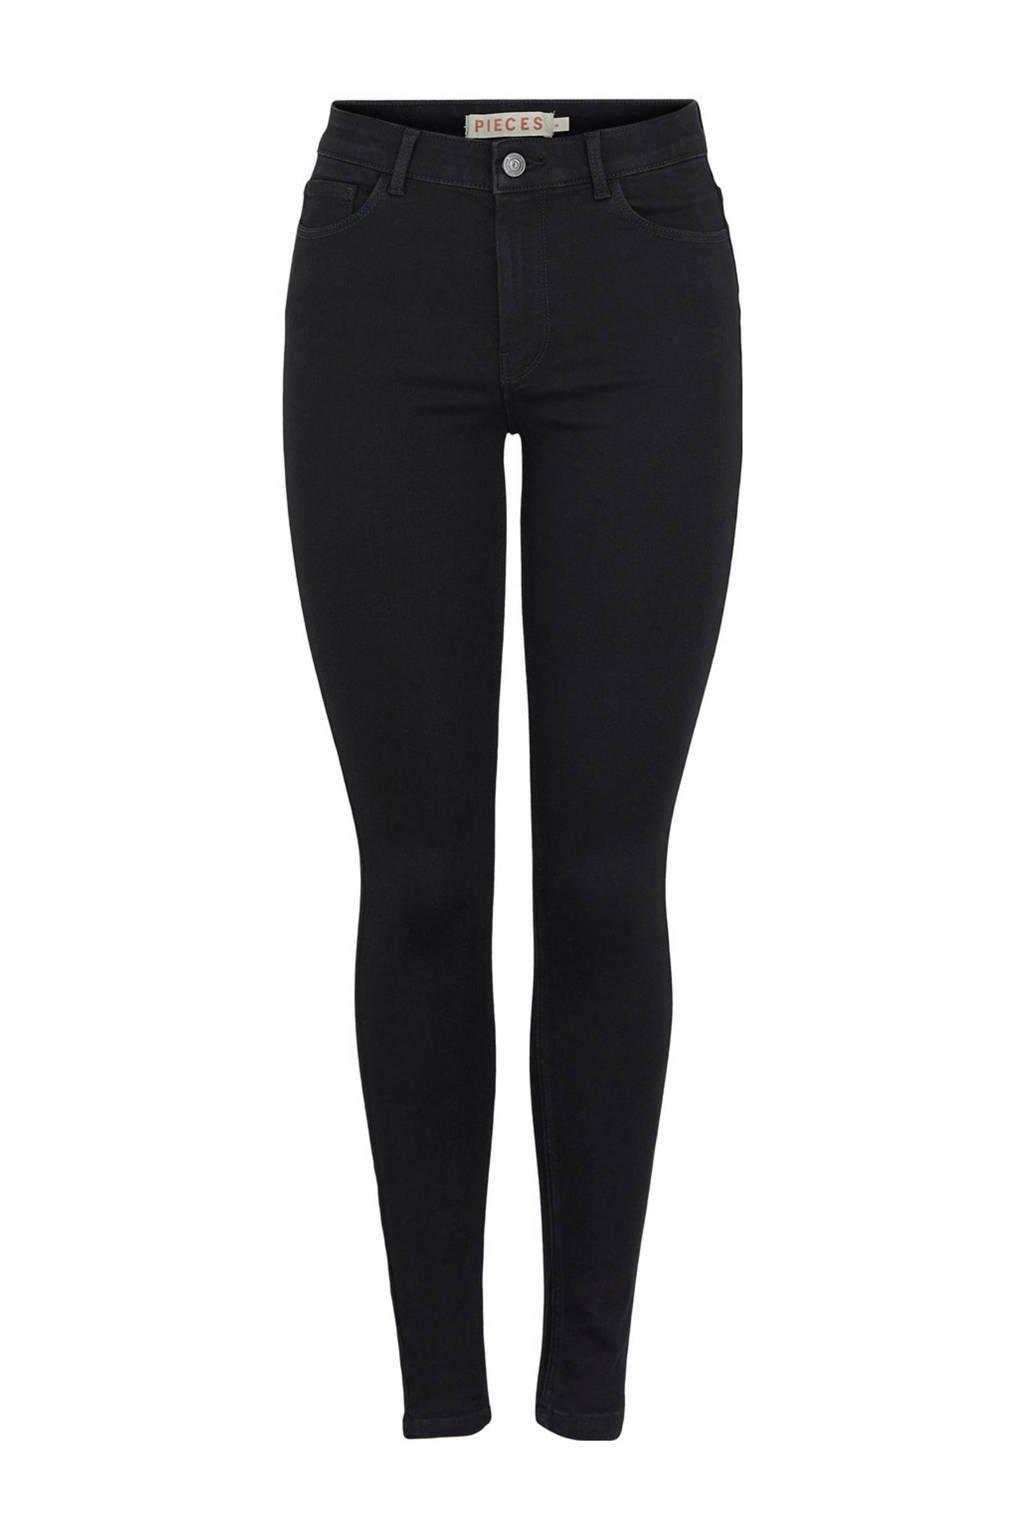 PIECES skinny jeans PCMIDFIVE zwart, Zwart